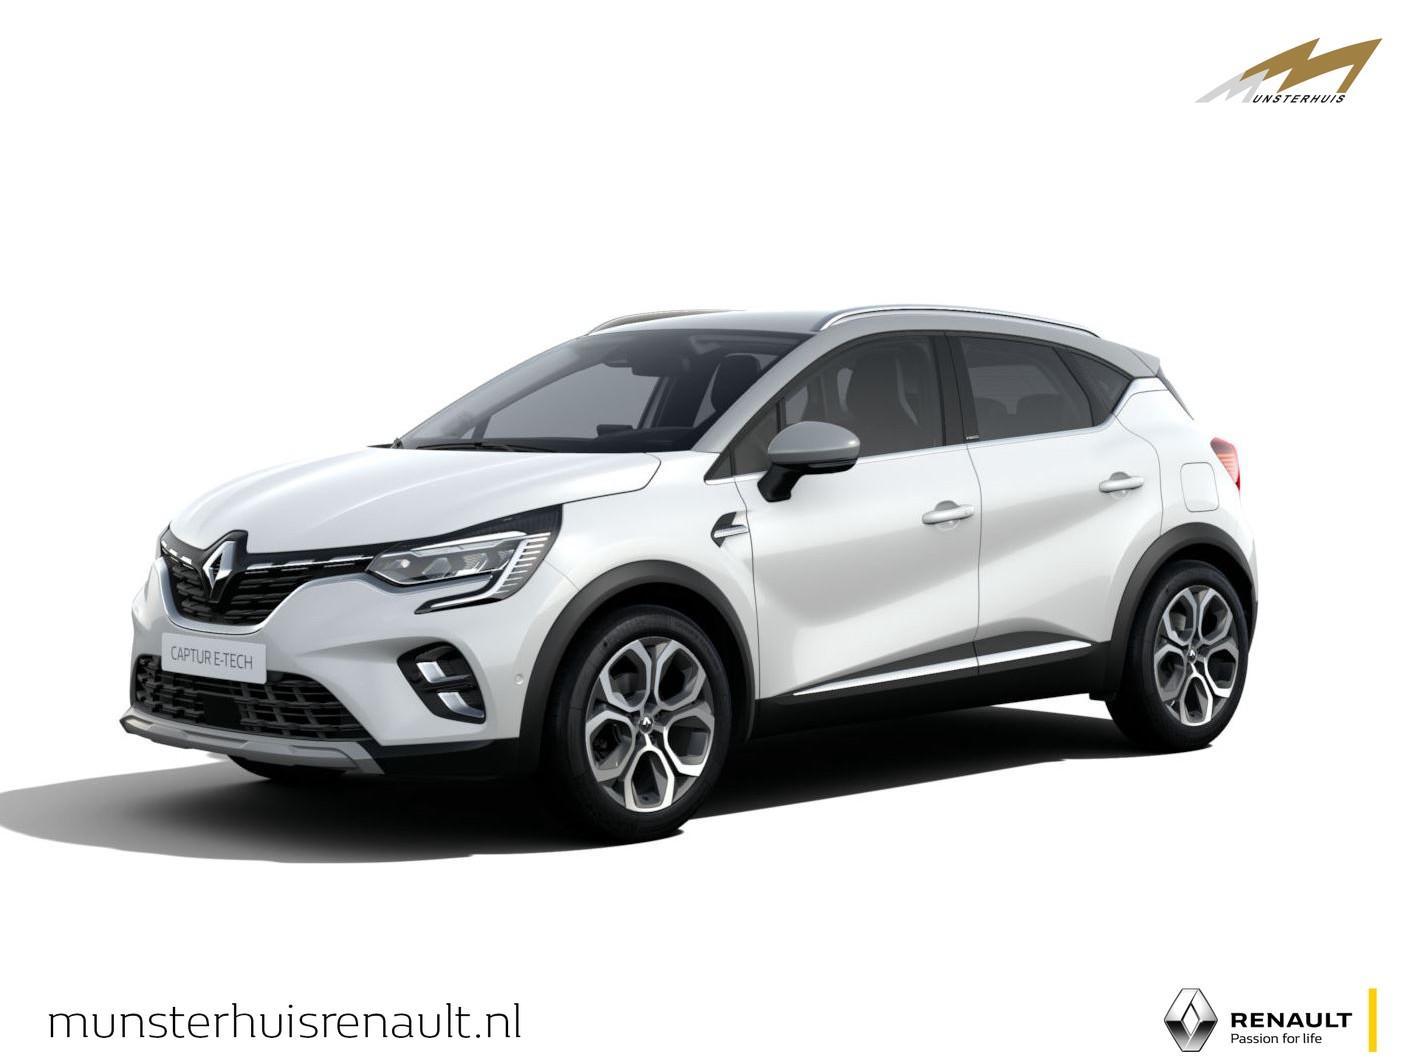 Renault Captur e-tech Plug-in hybrid 160 edition one - nieuw - hybride - wordt verwacht